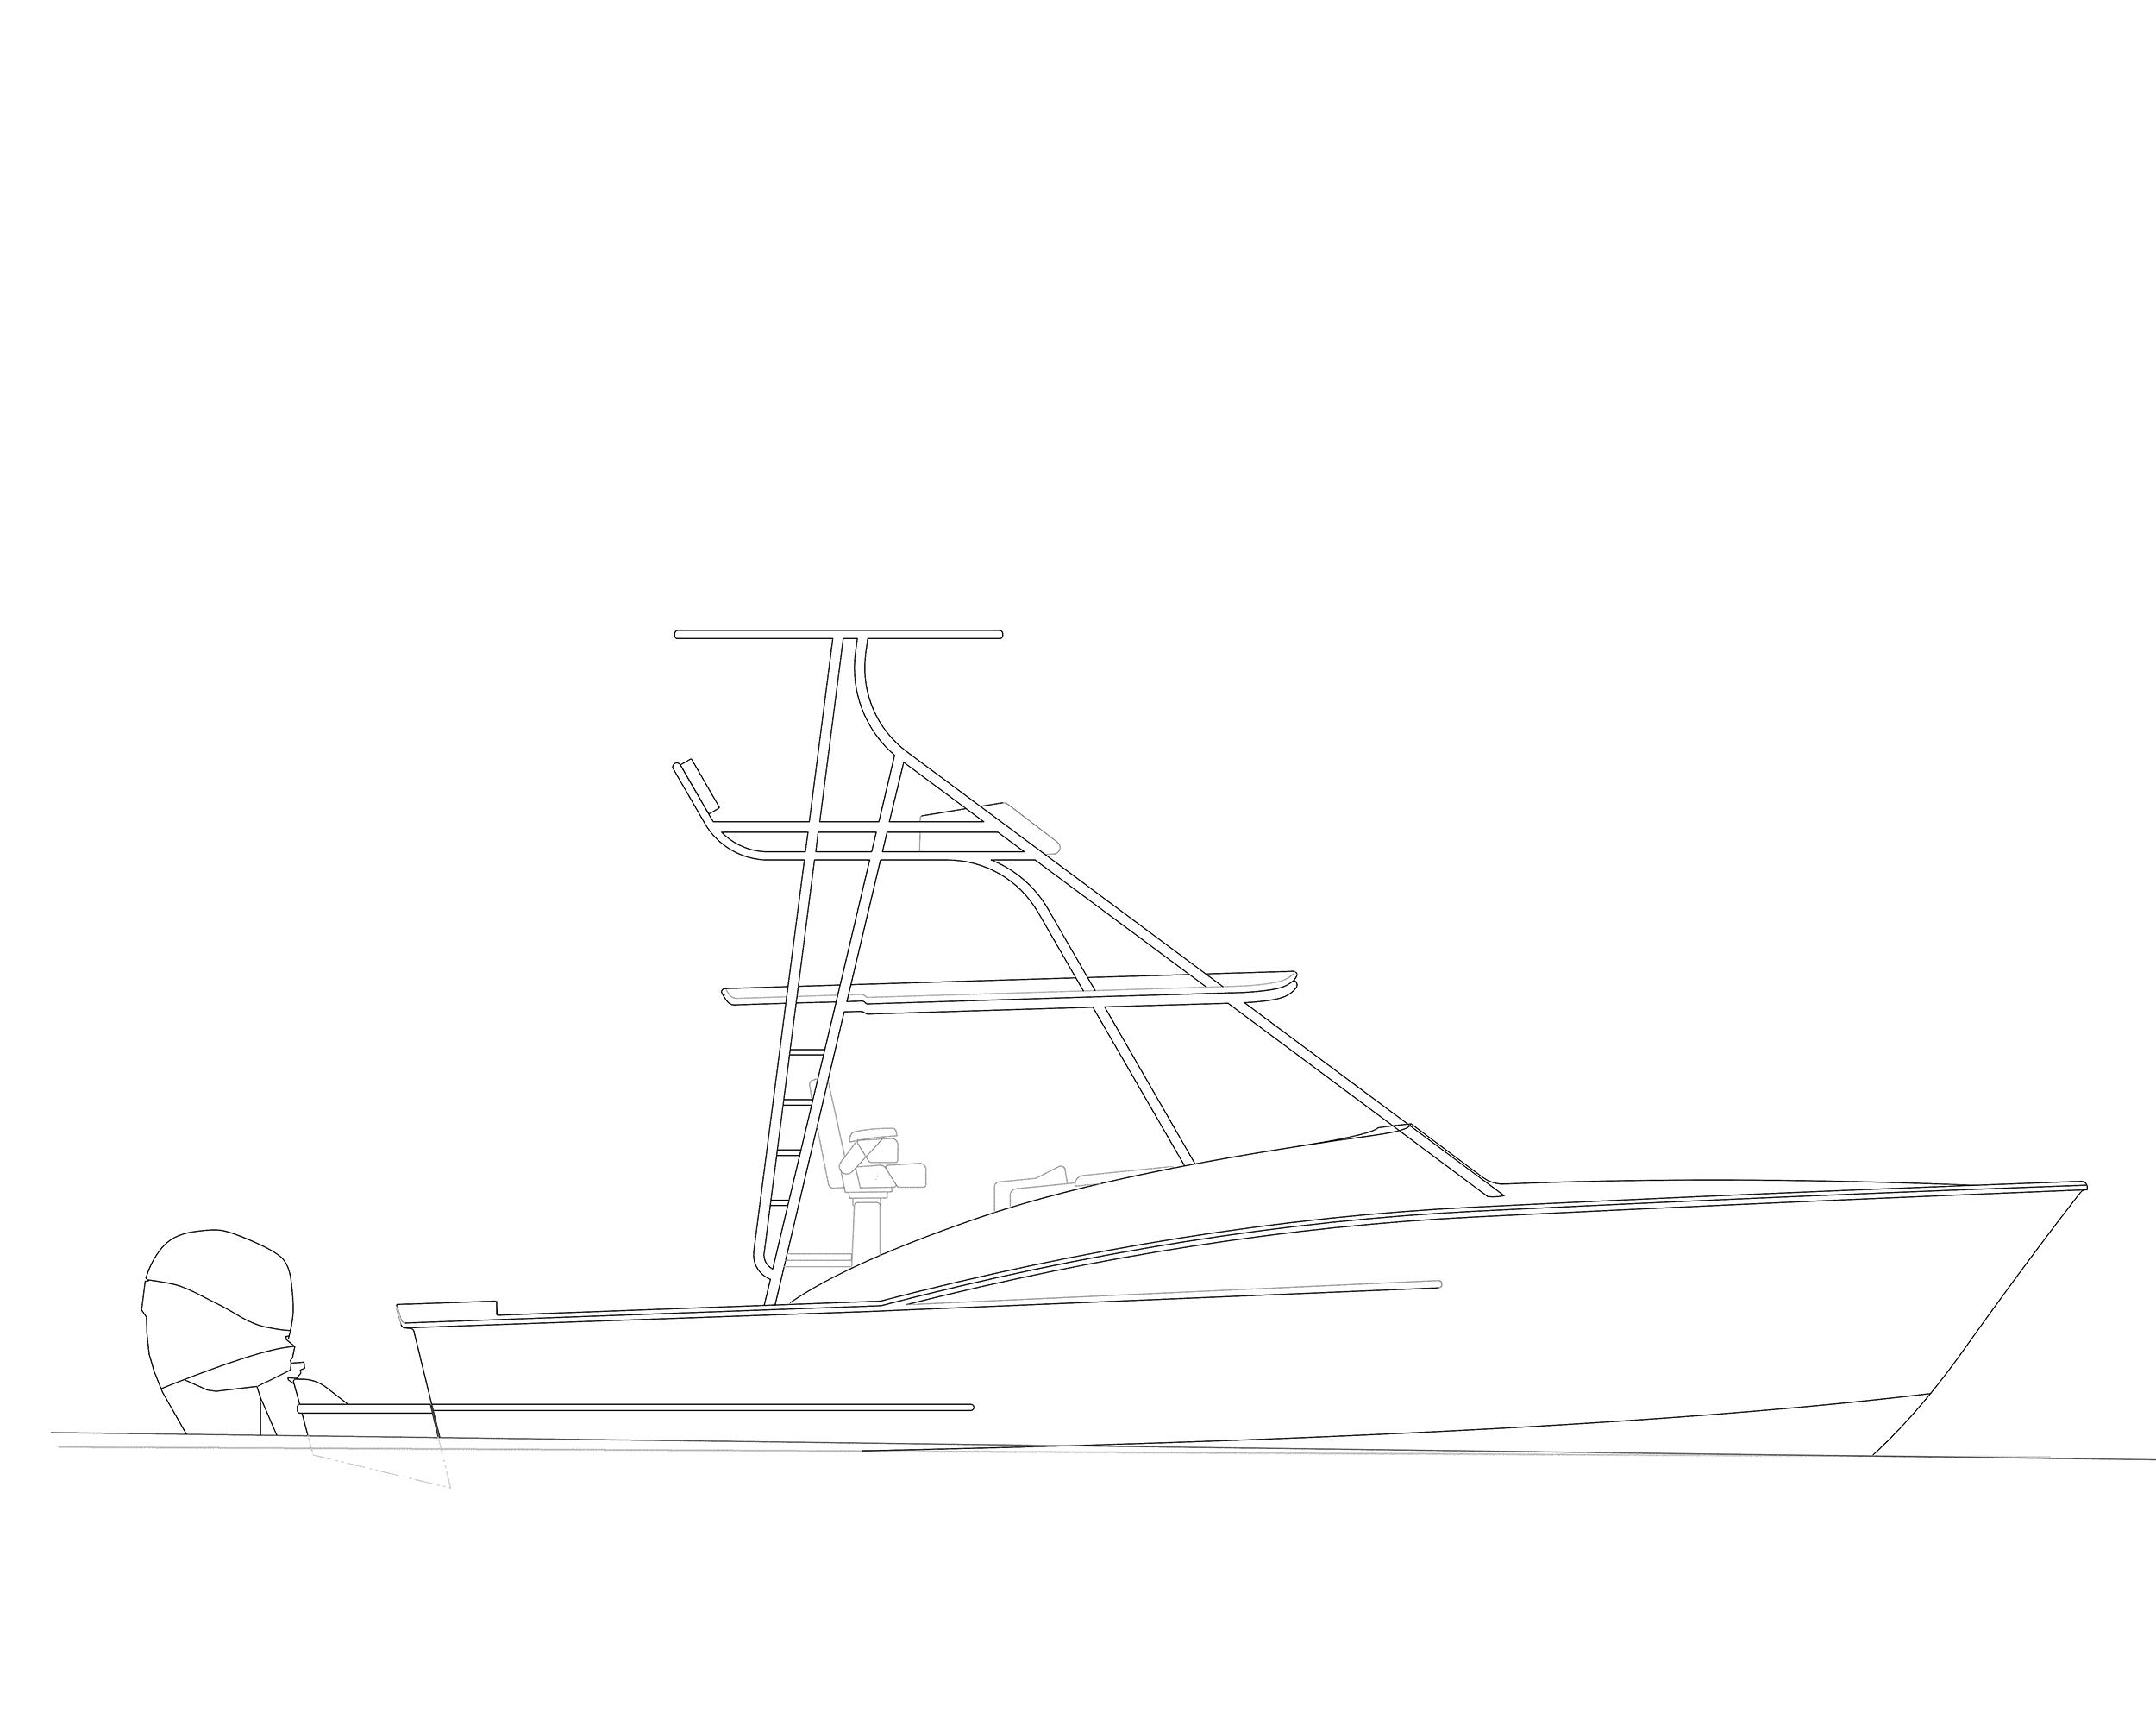 OBX 34 XP FE